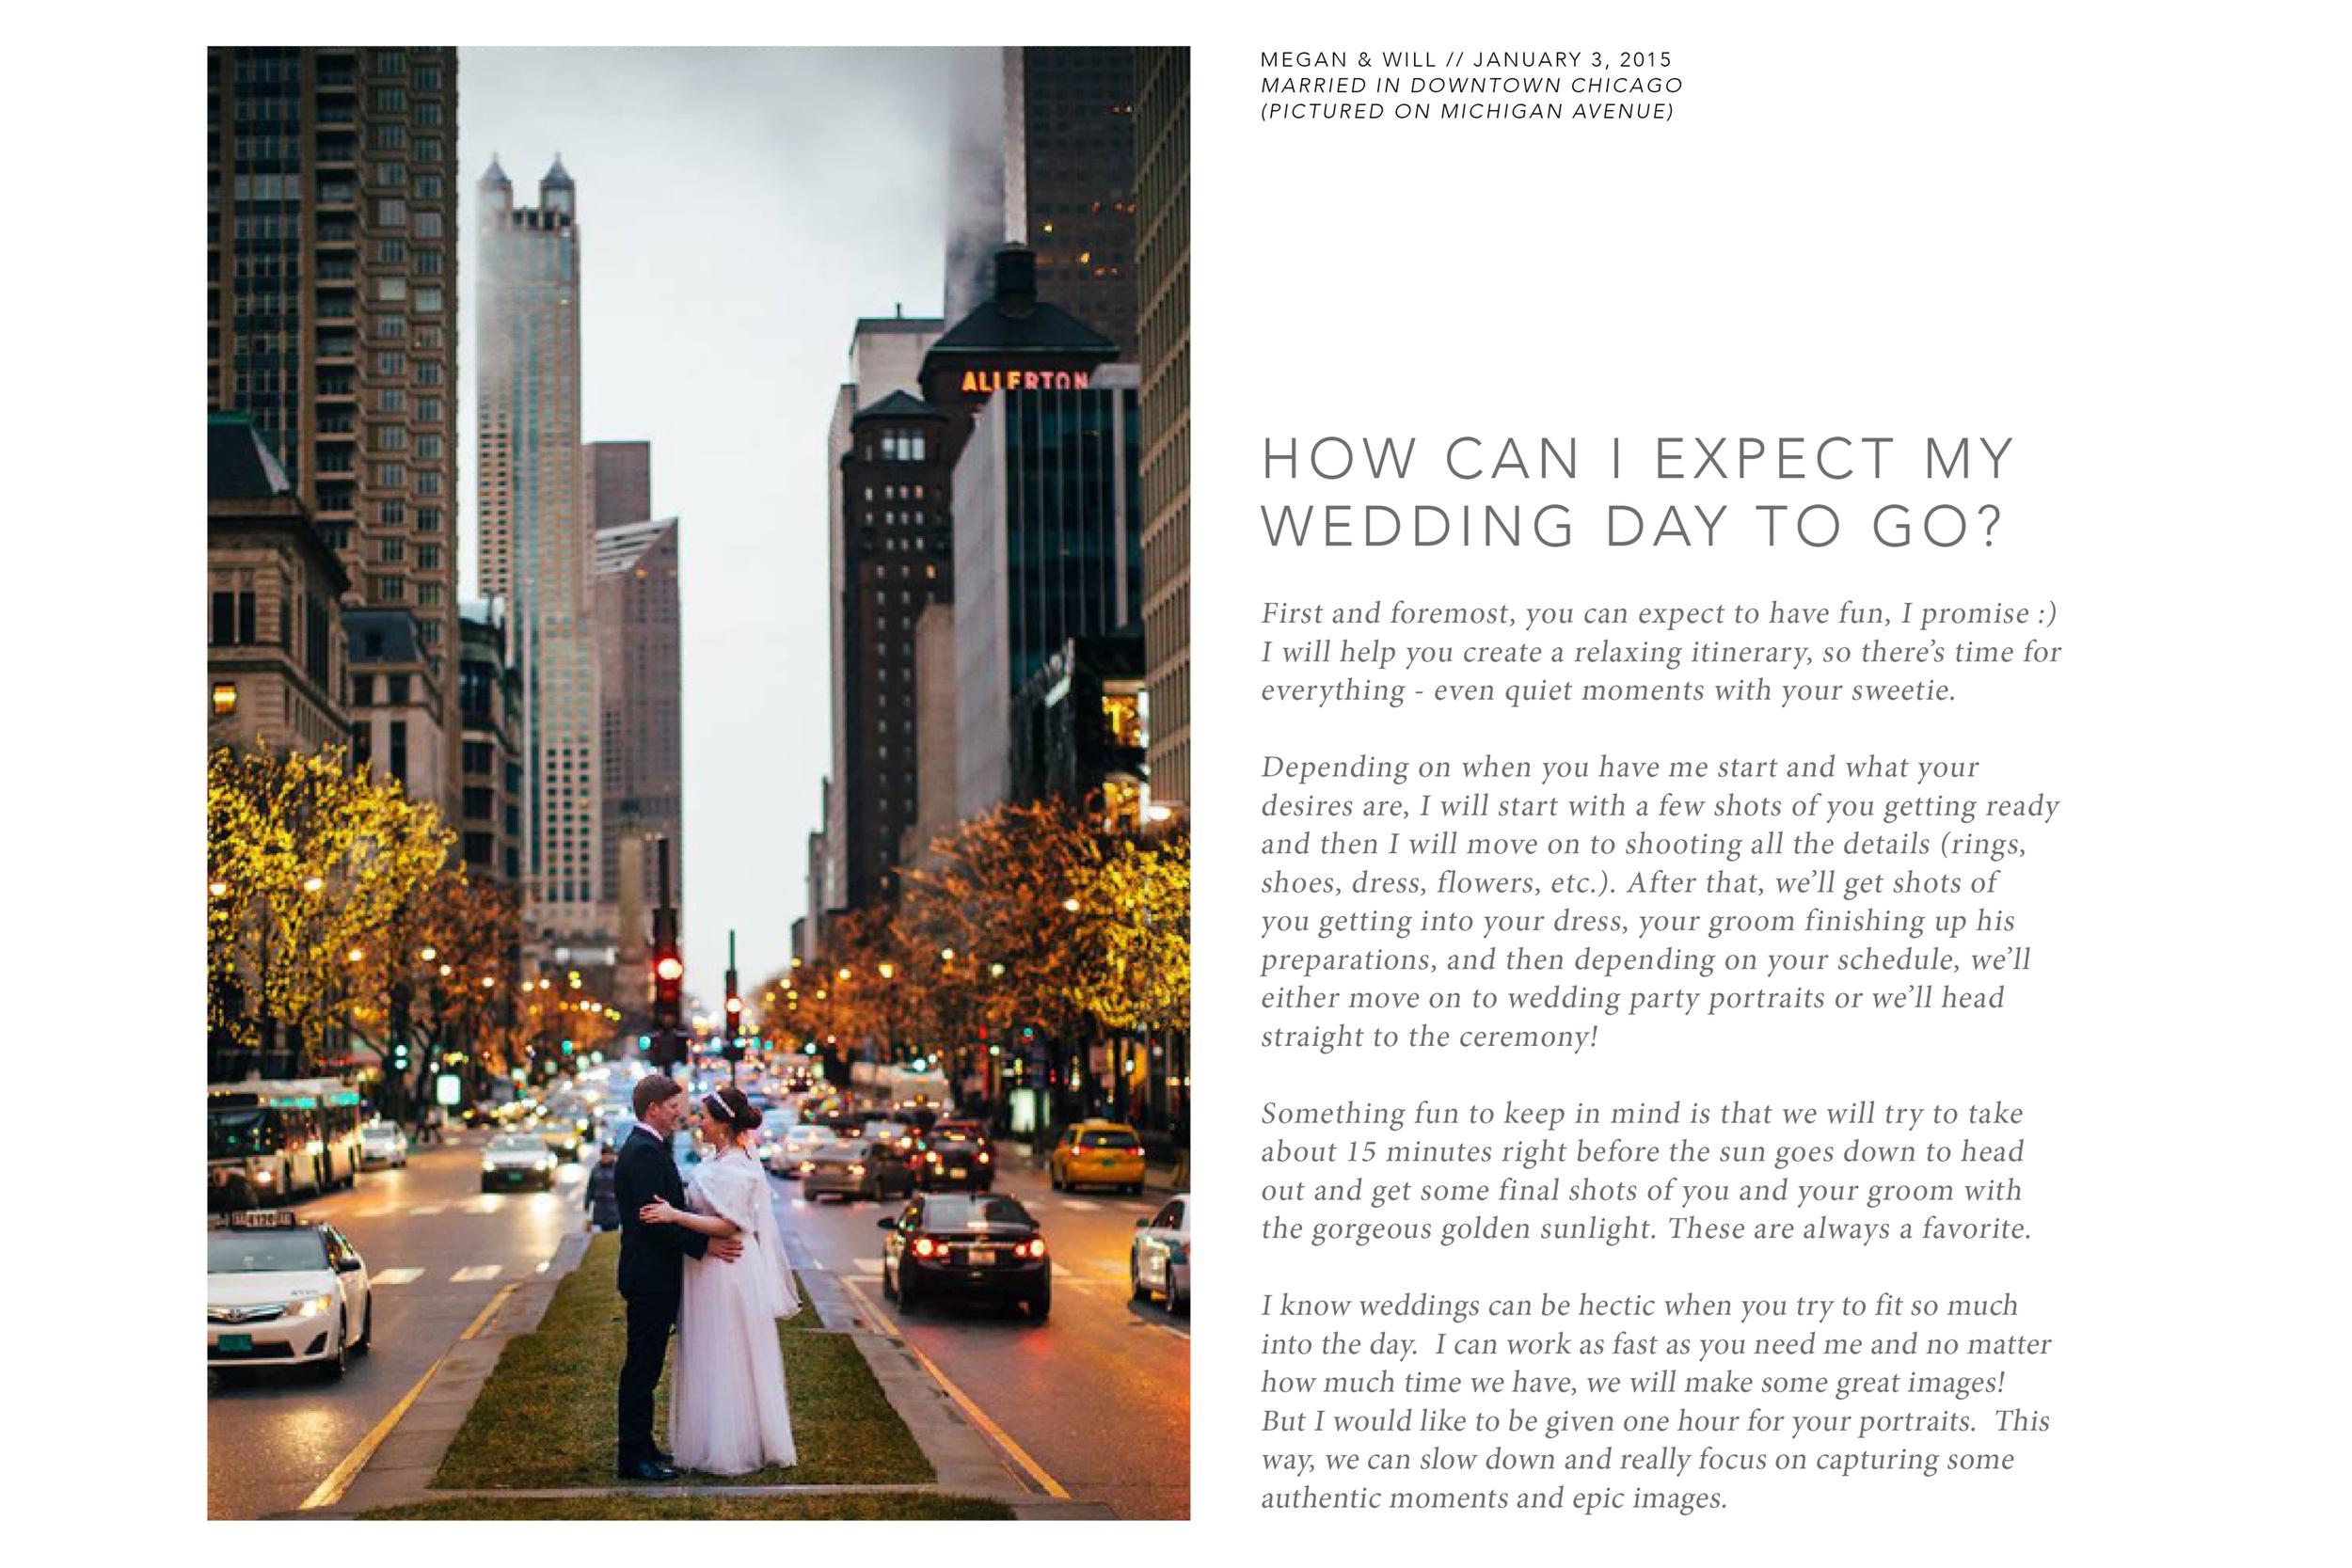 2016wedding-guide5.jpg